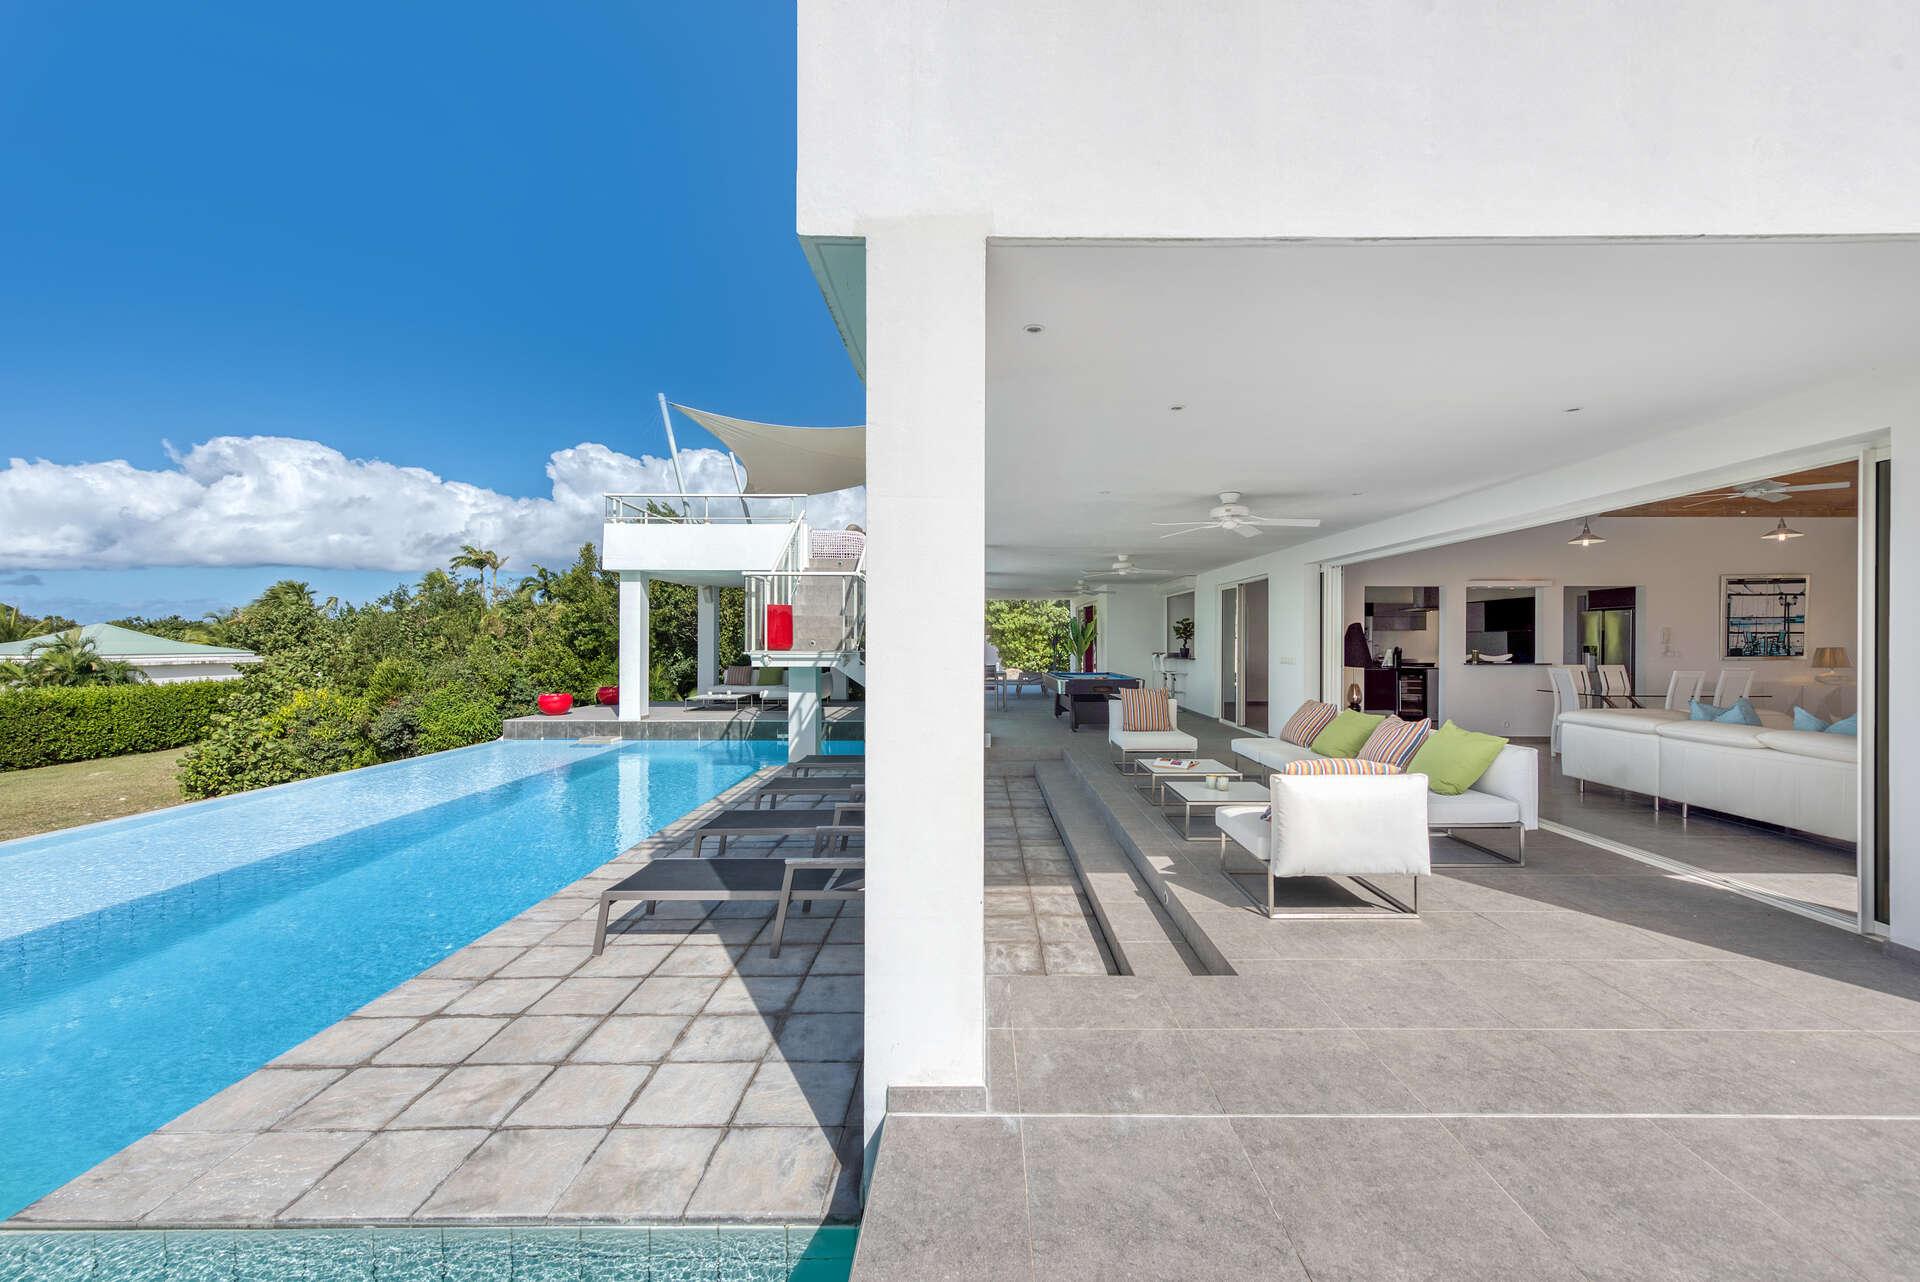 Luxury villa rentals caribbean - St martin - Saint martin french - Les terres basses - Grand Palms - Image 1/25